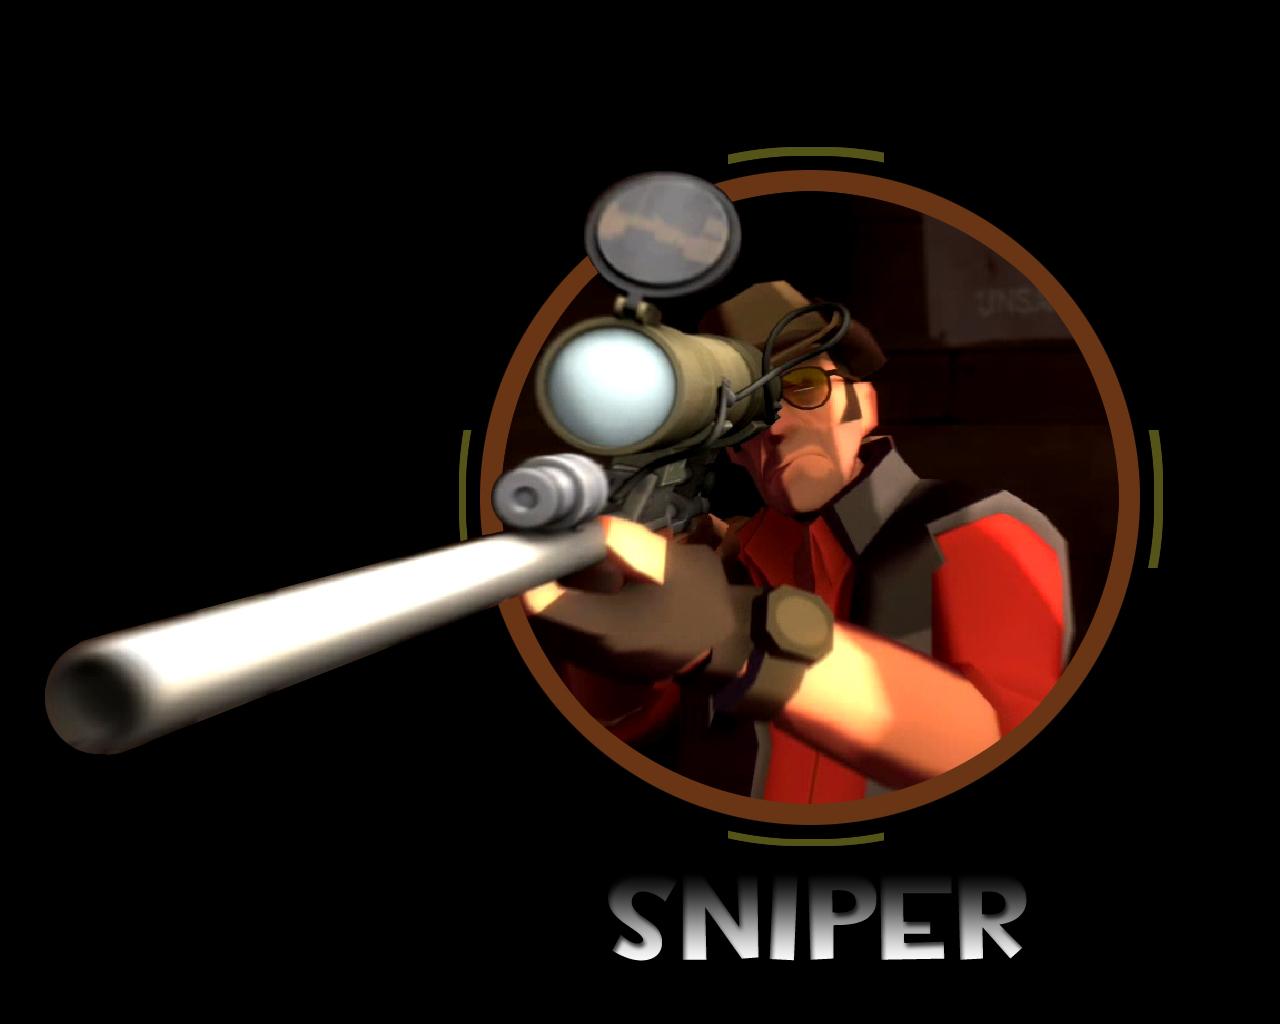 TF2 Sniper by The-Loiterer on DeviantArt